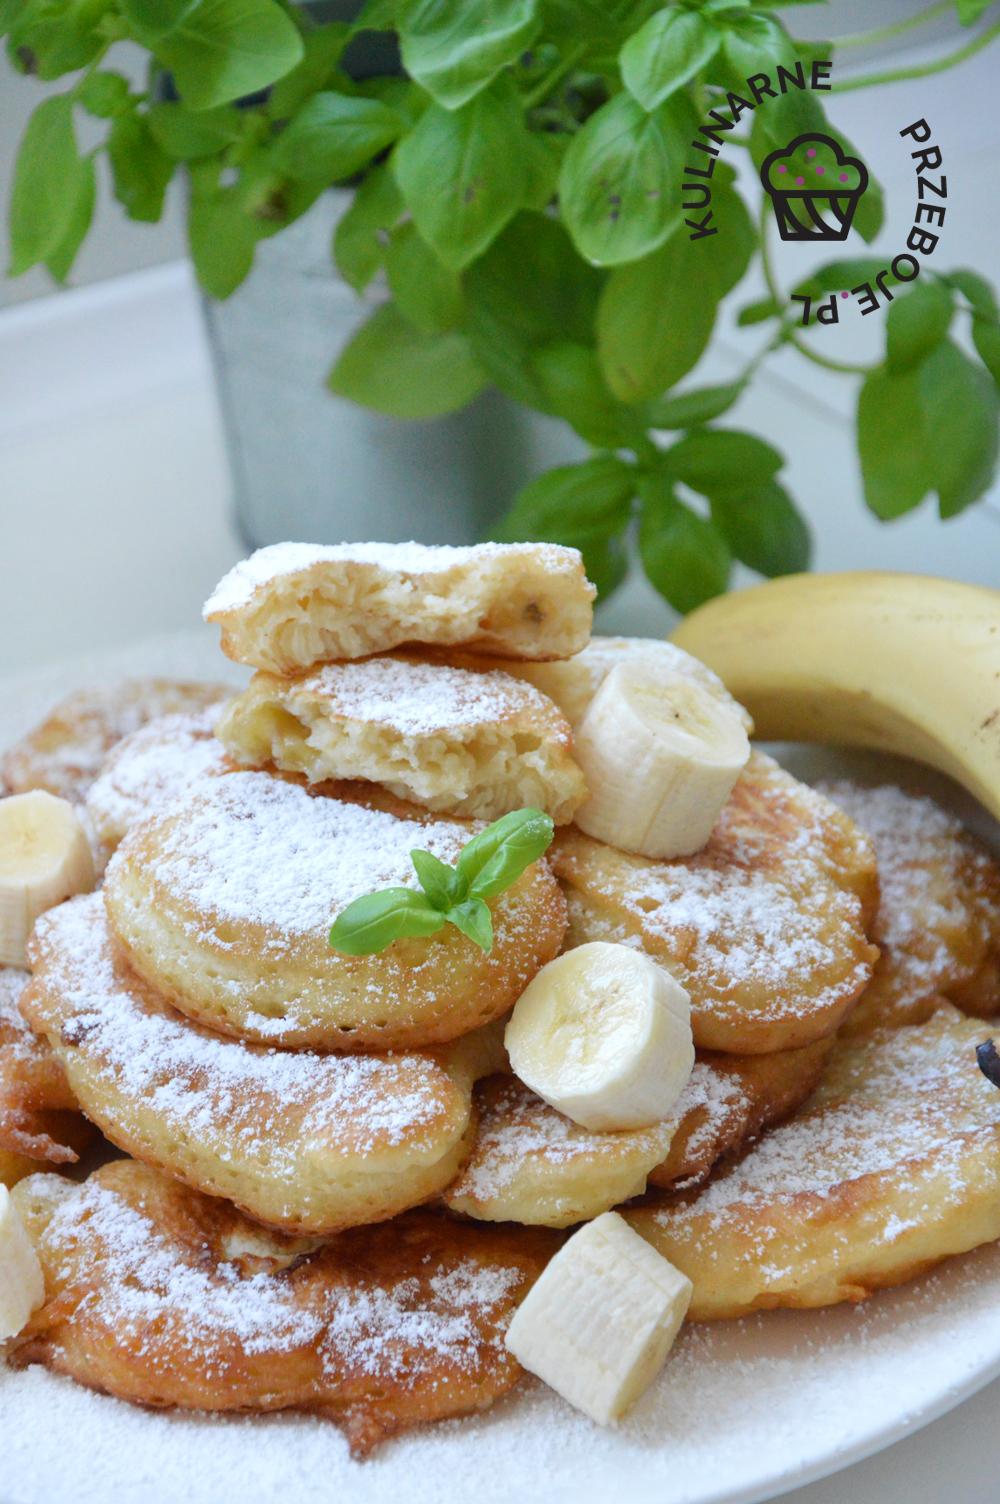 Racuchy z bananami na maślance